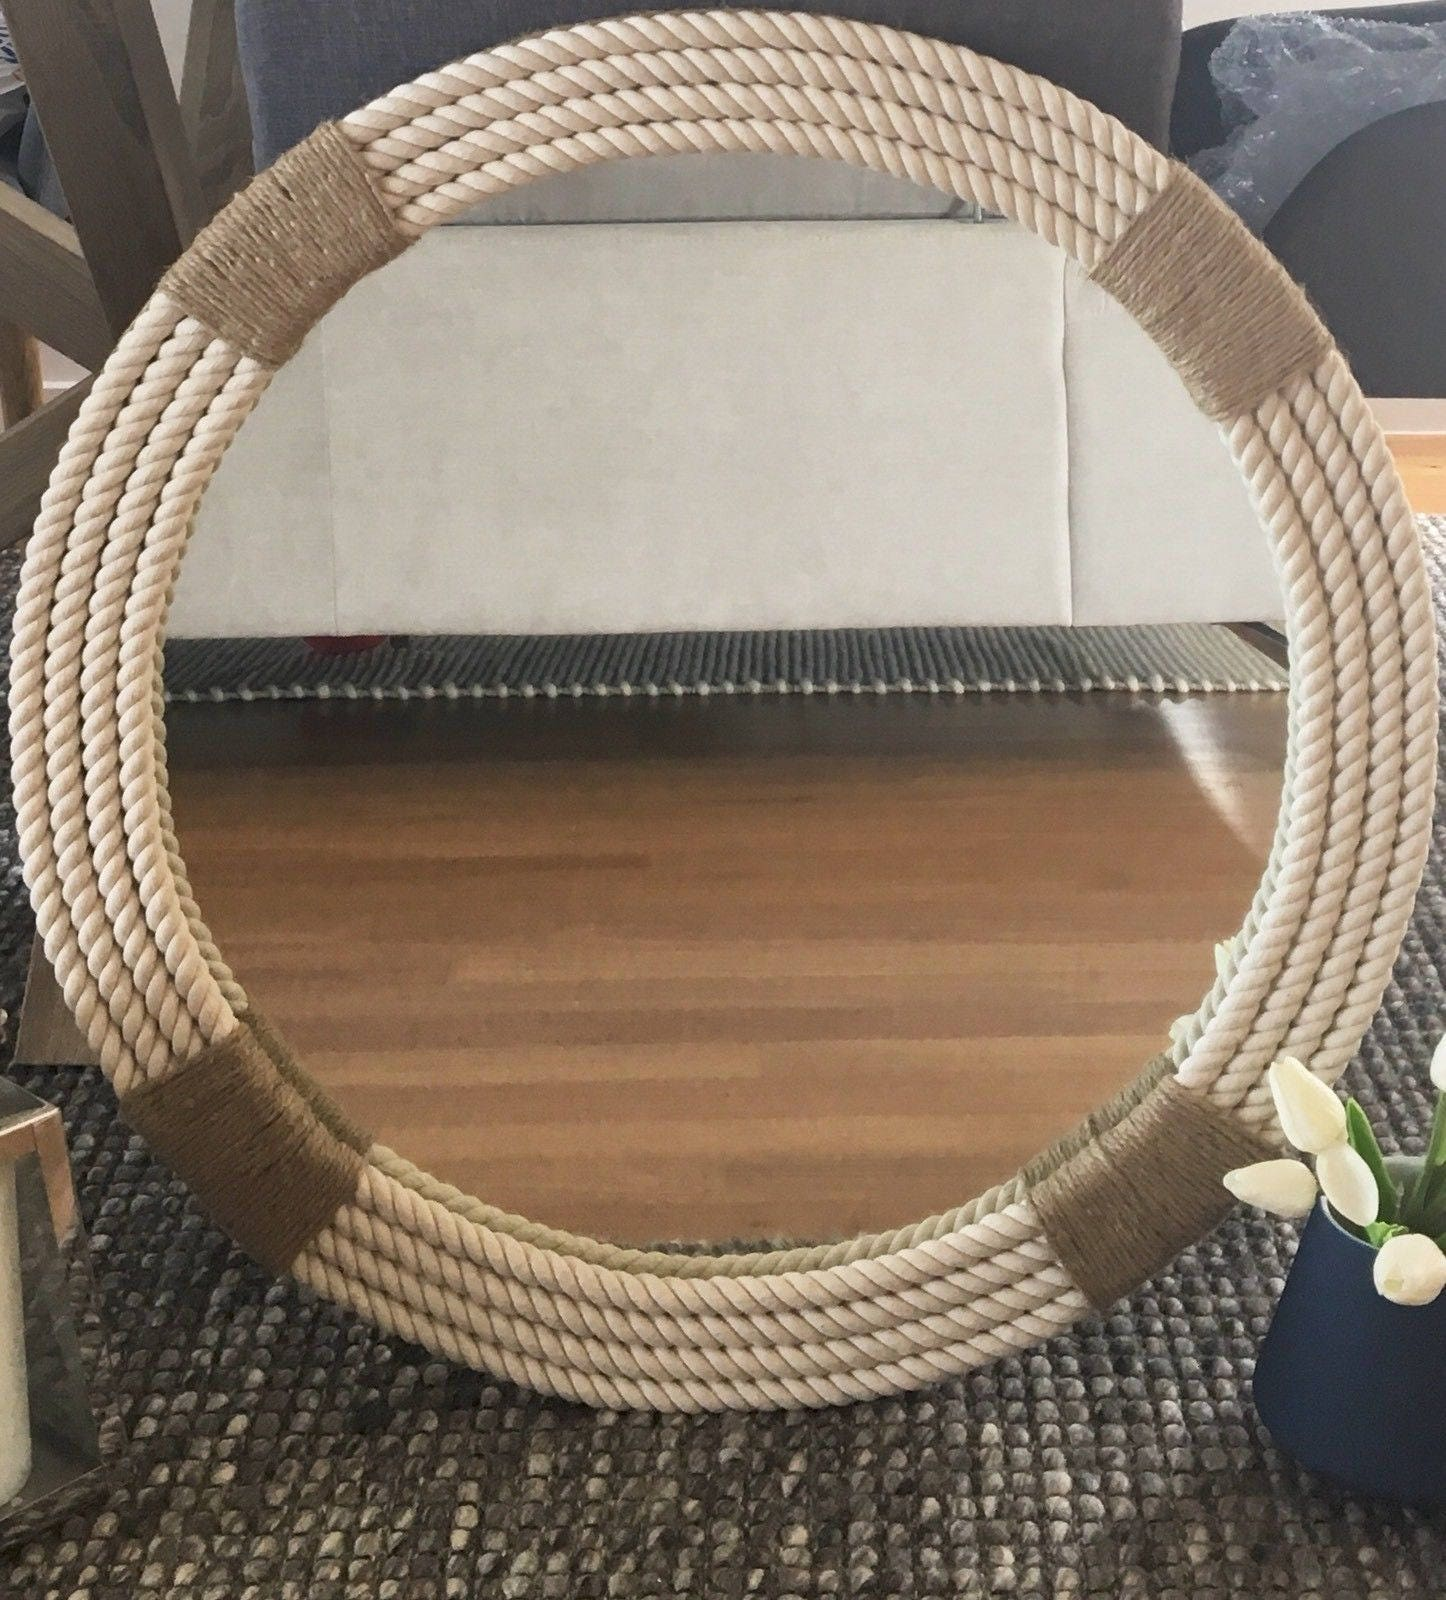 Nautical Rope Decor Items: LARGE Hampton Nautical Themed Round Rope Mirror Home Decor